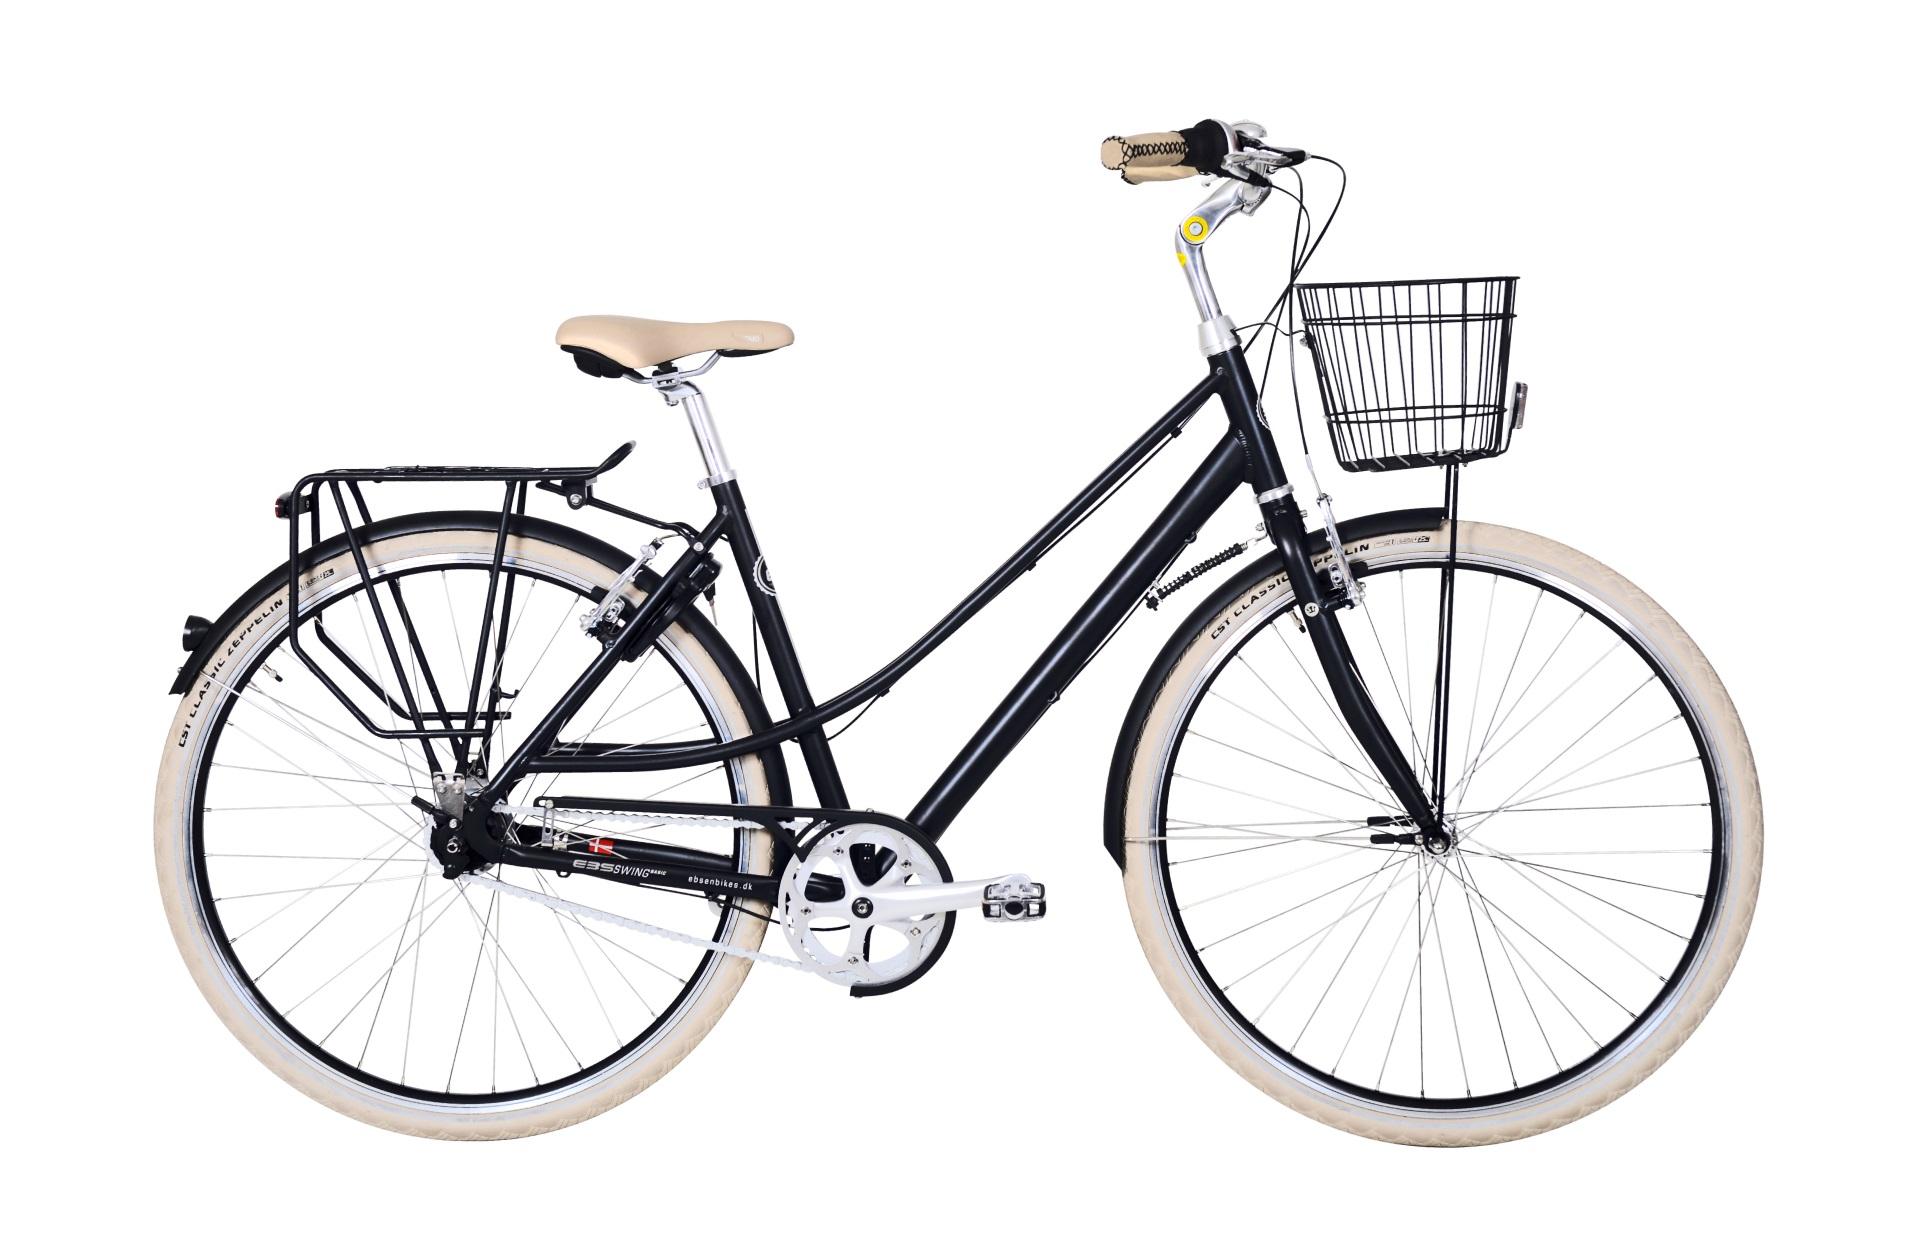 Pedalatleten Ebsen Swing Dame 7 Gear Matsort 50Cm - 2019 Cykler||Ebsen Bikes